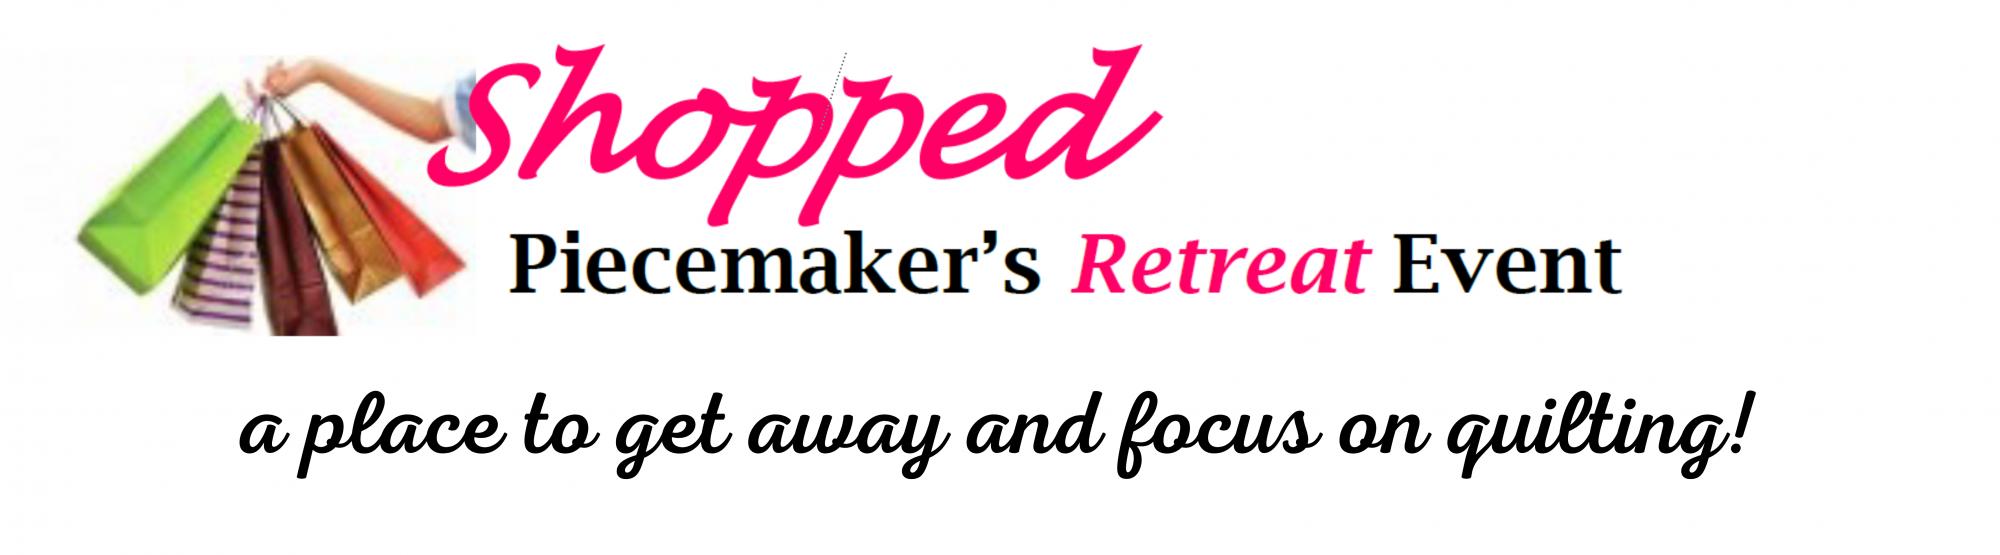 Shopped Piecemaker's Retreat